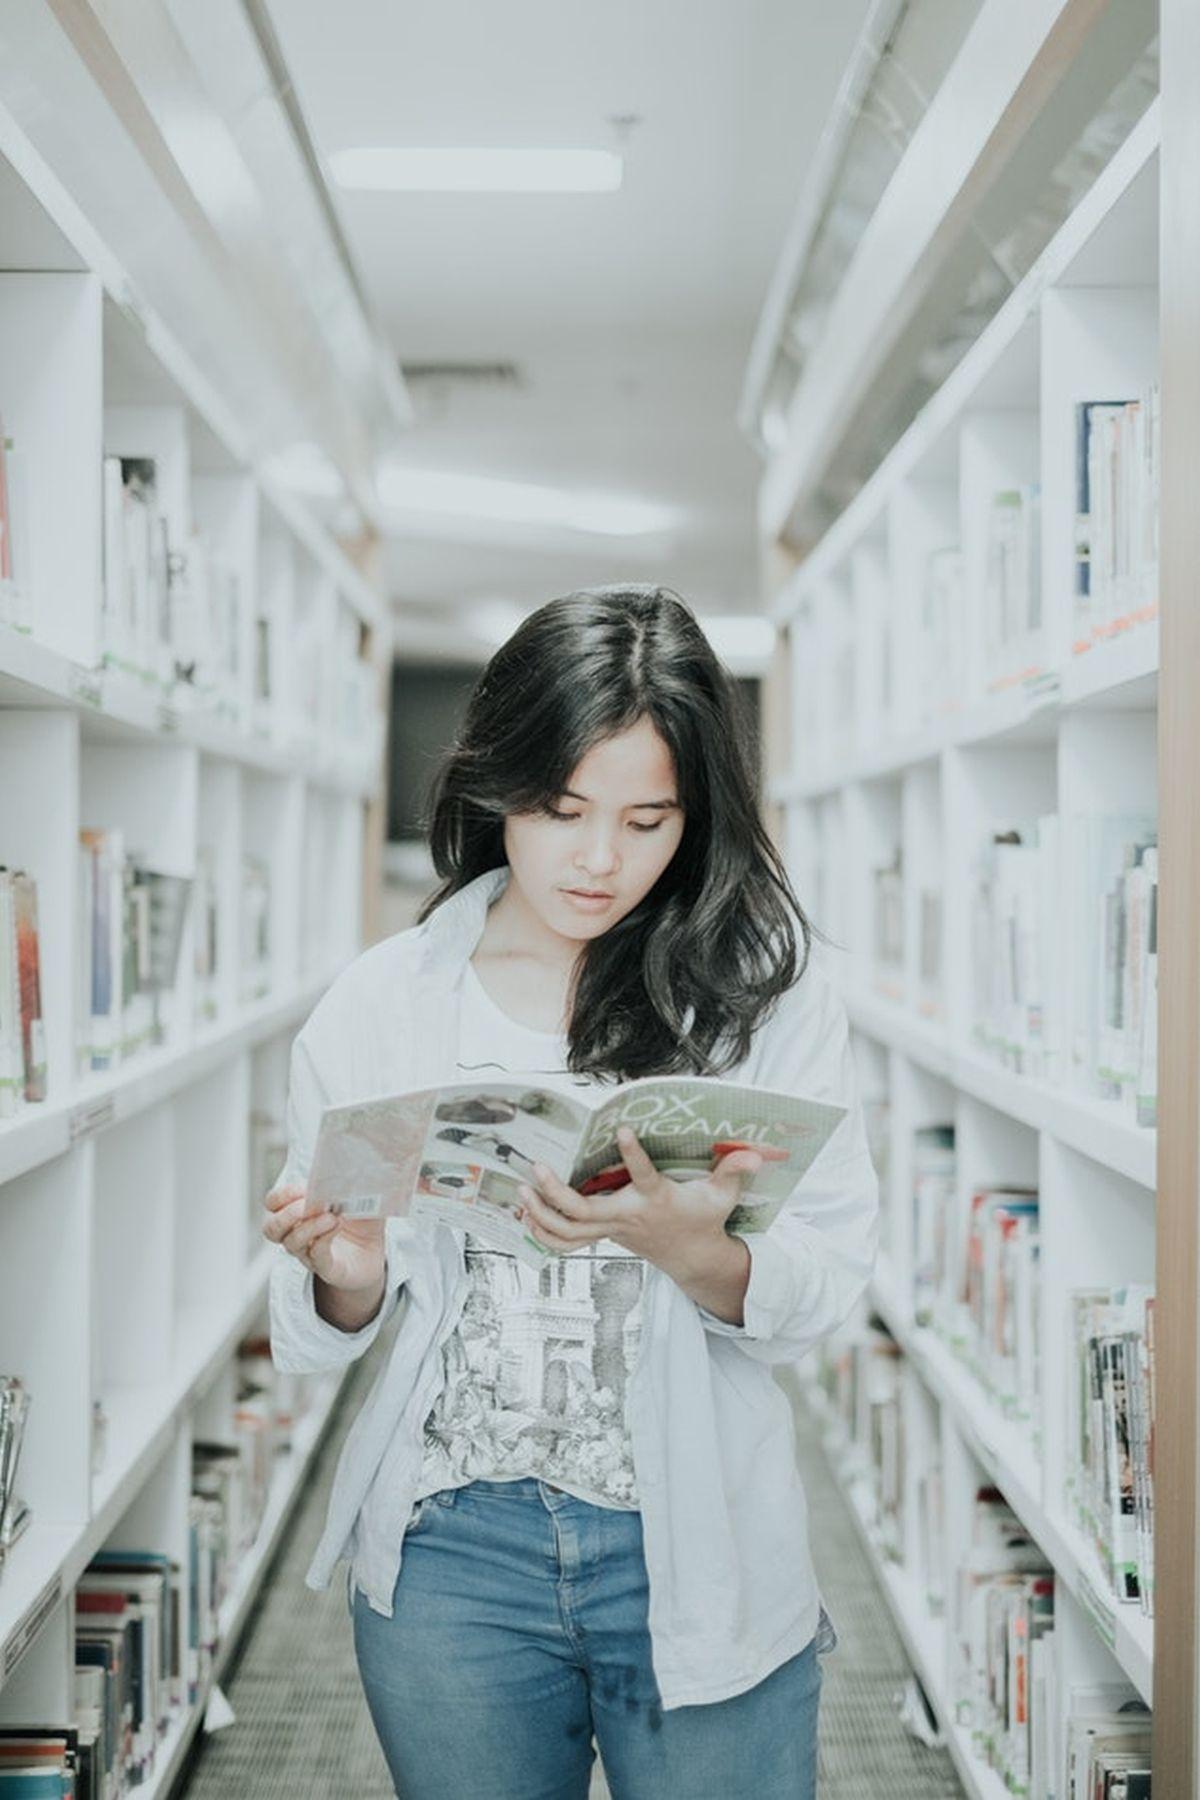 Bibliotheksumzug